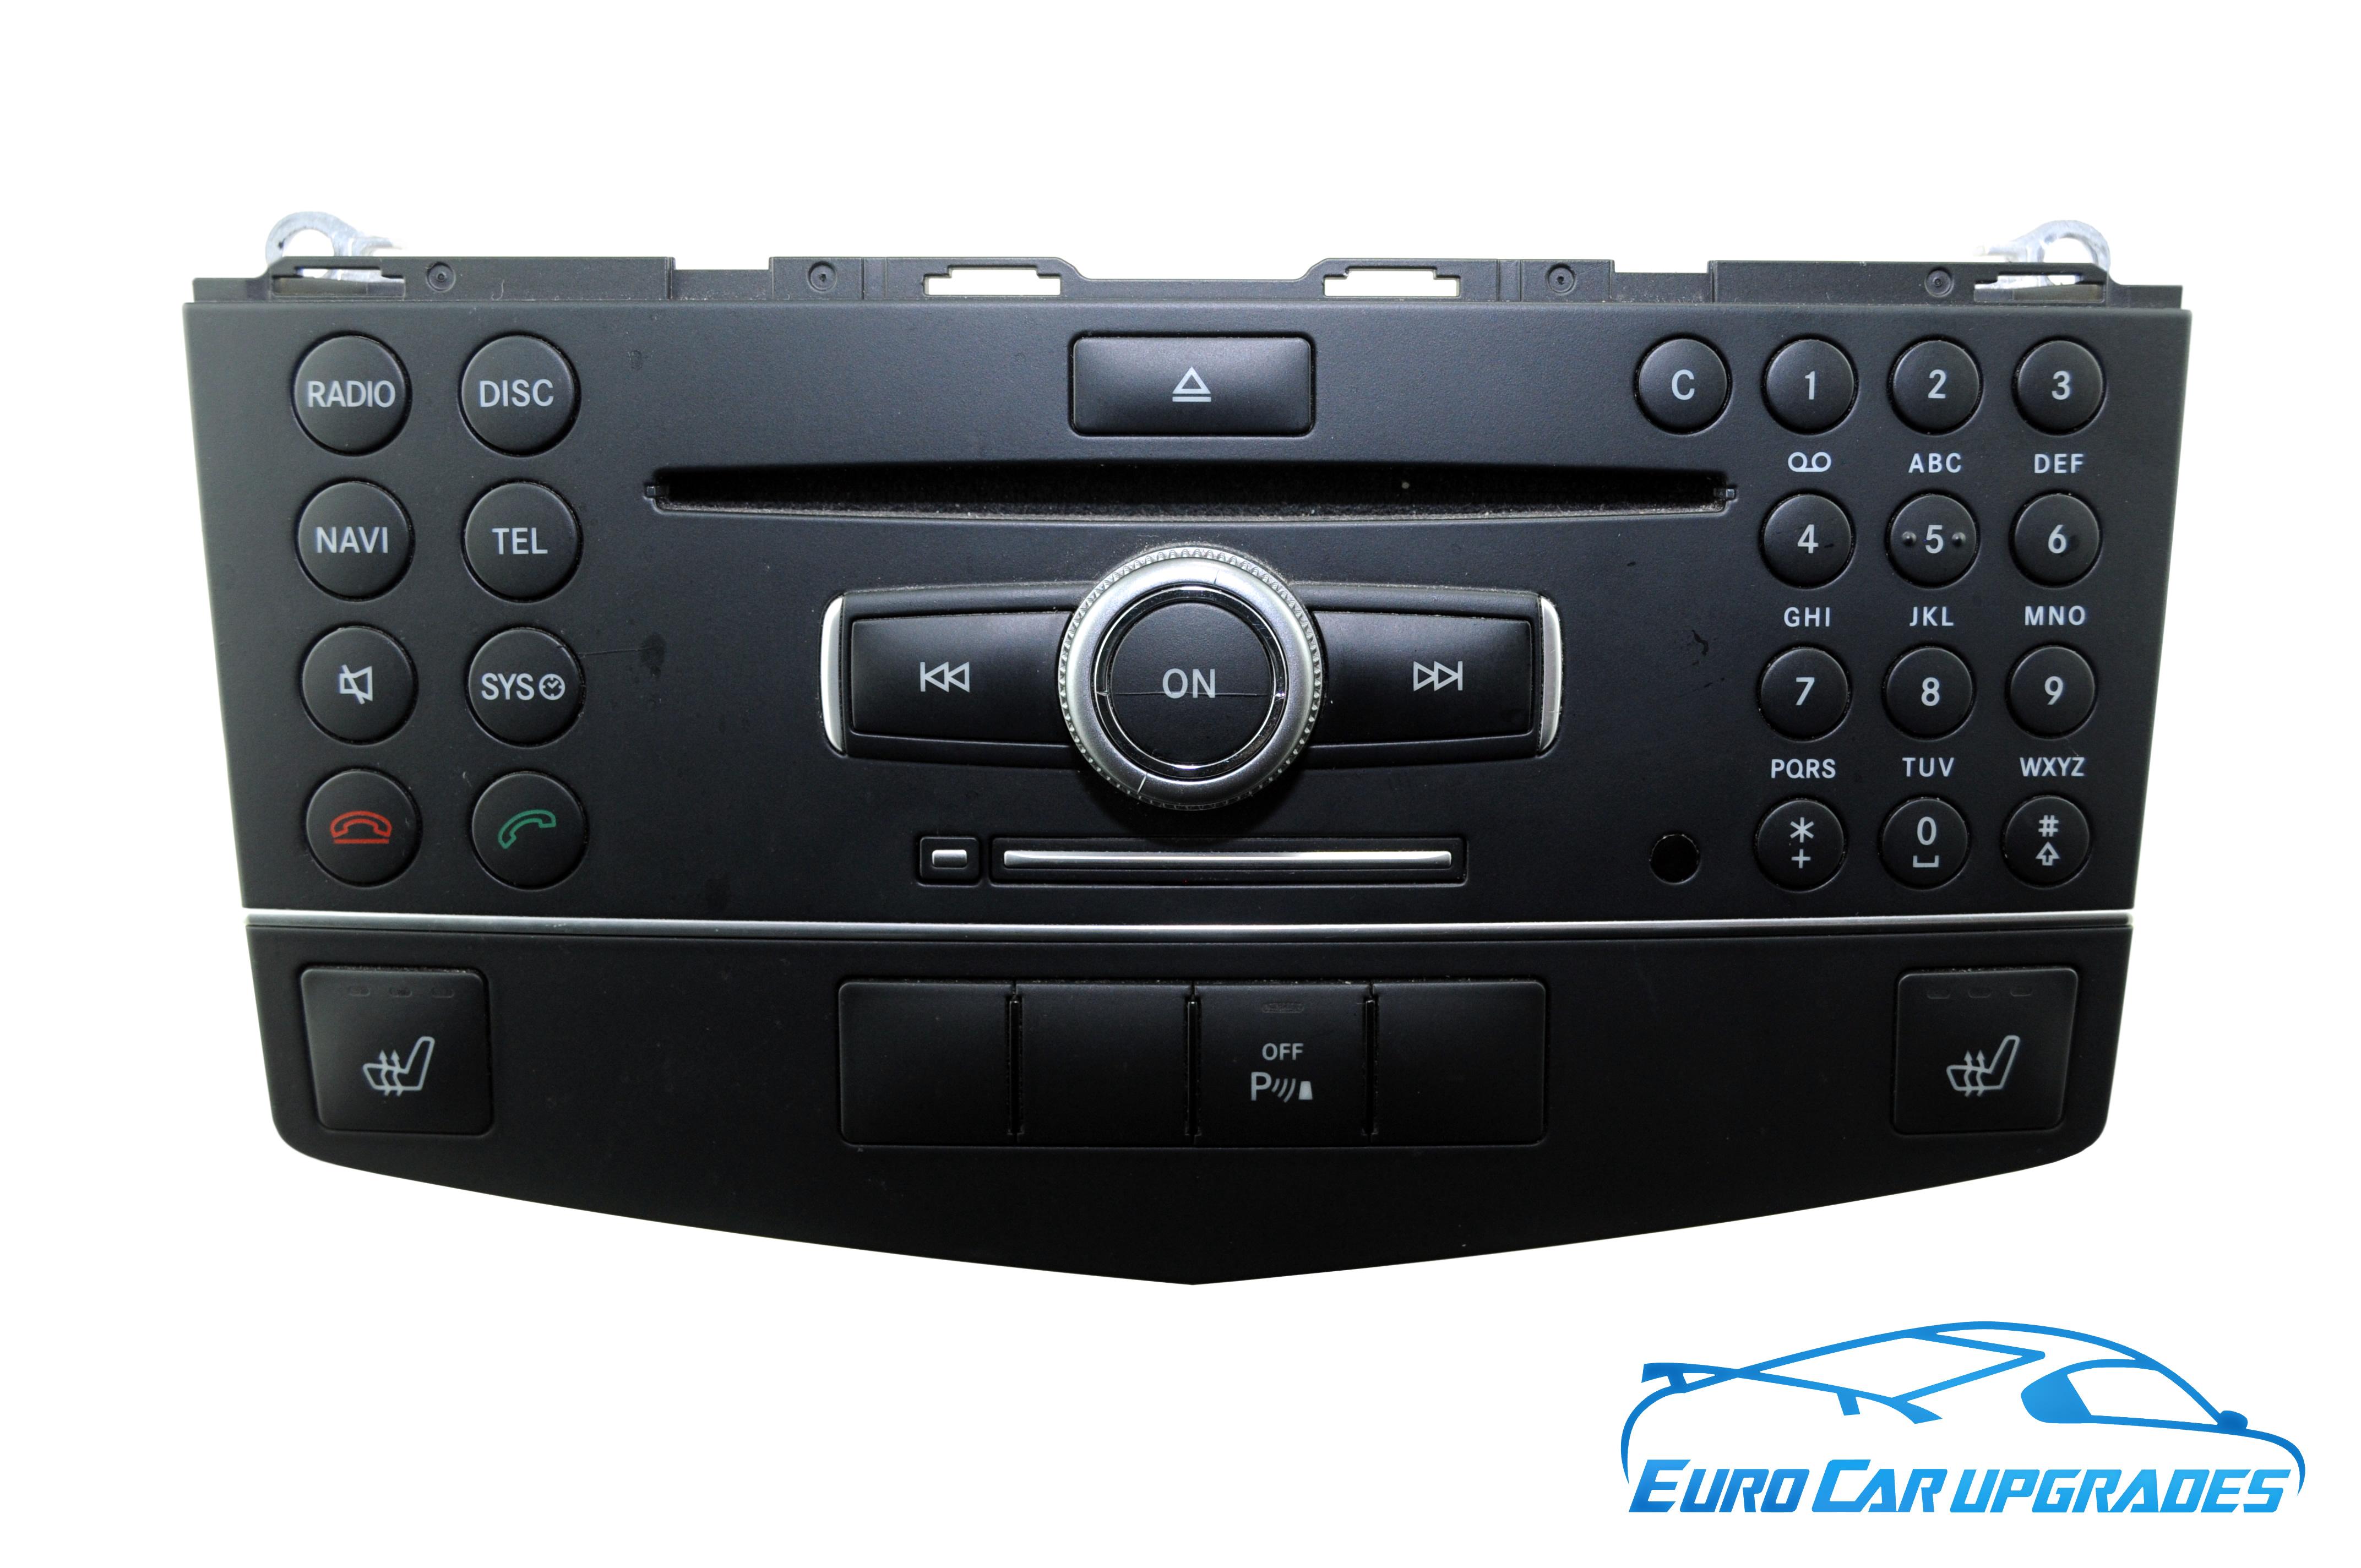 genuine Mercedes-Benz Navigation System COMAND APS w204 s204 ntg4 C-Class NTG  4 A2049006403, Mercedes Navigation System COMAND APS W204 NTG4 C Class NTG 4  ...